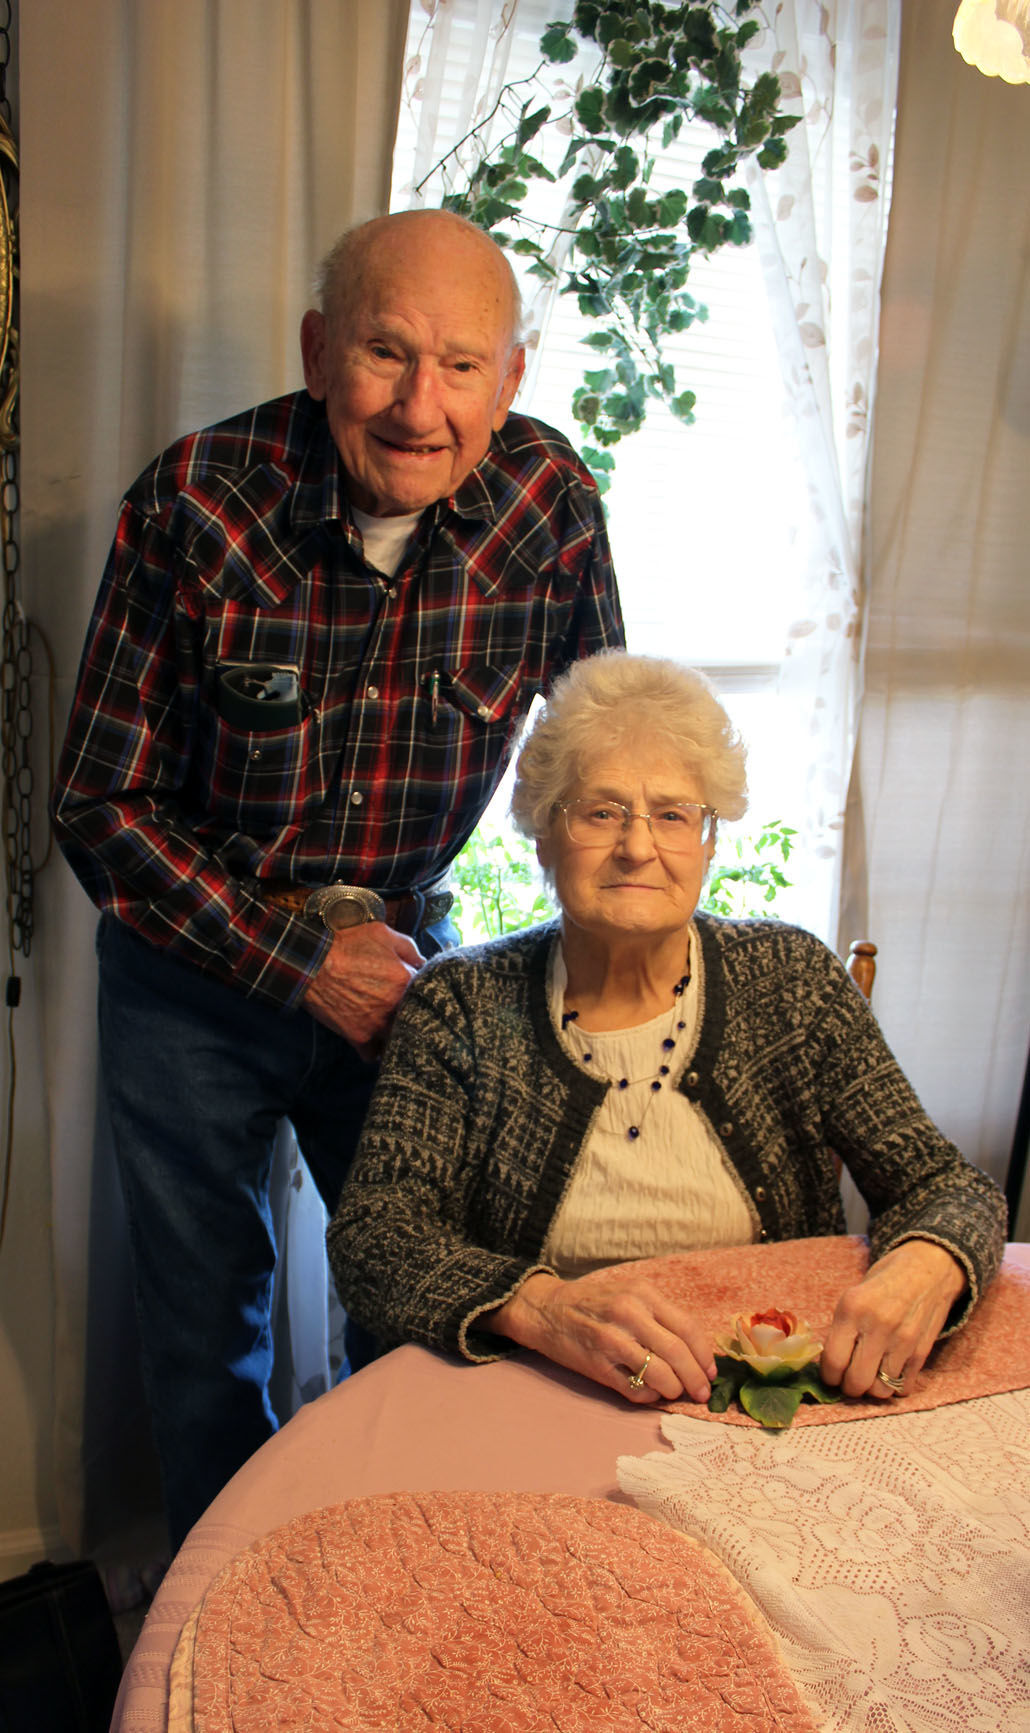 Turning 100, a century of memories